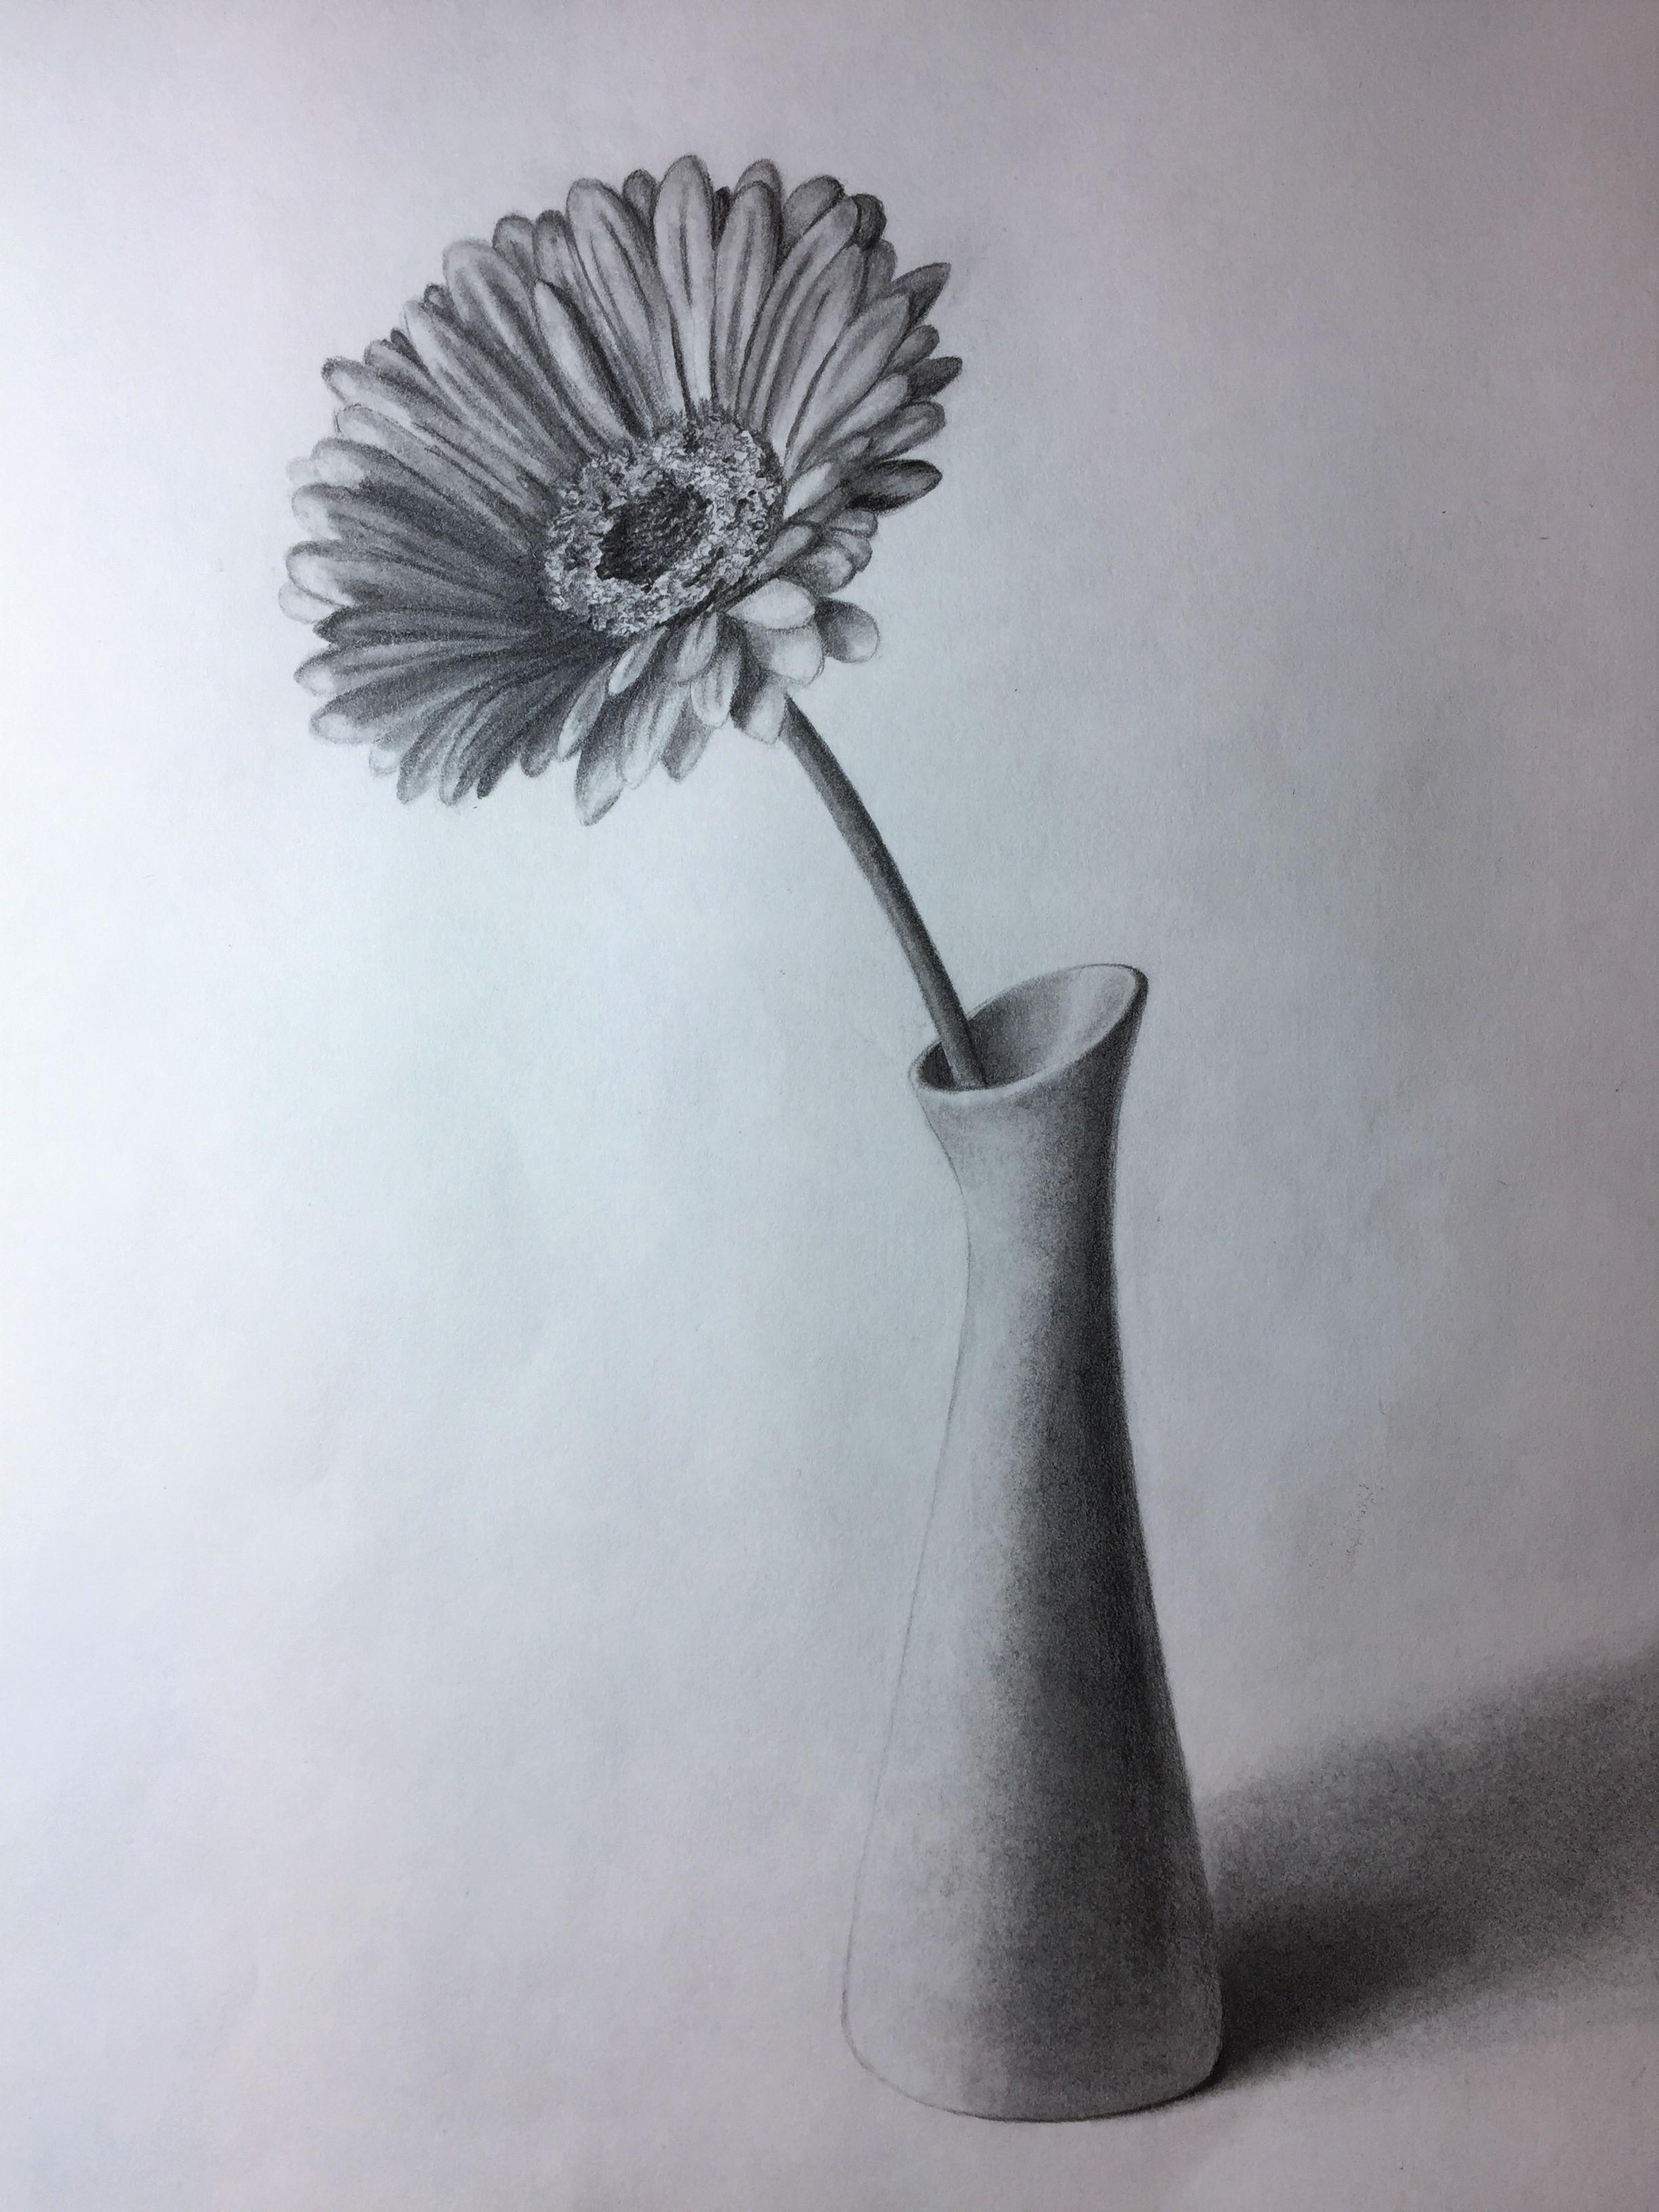 Vase Pencil Drawing At Getdrawings